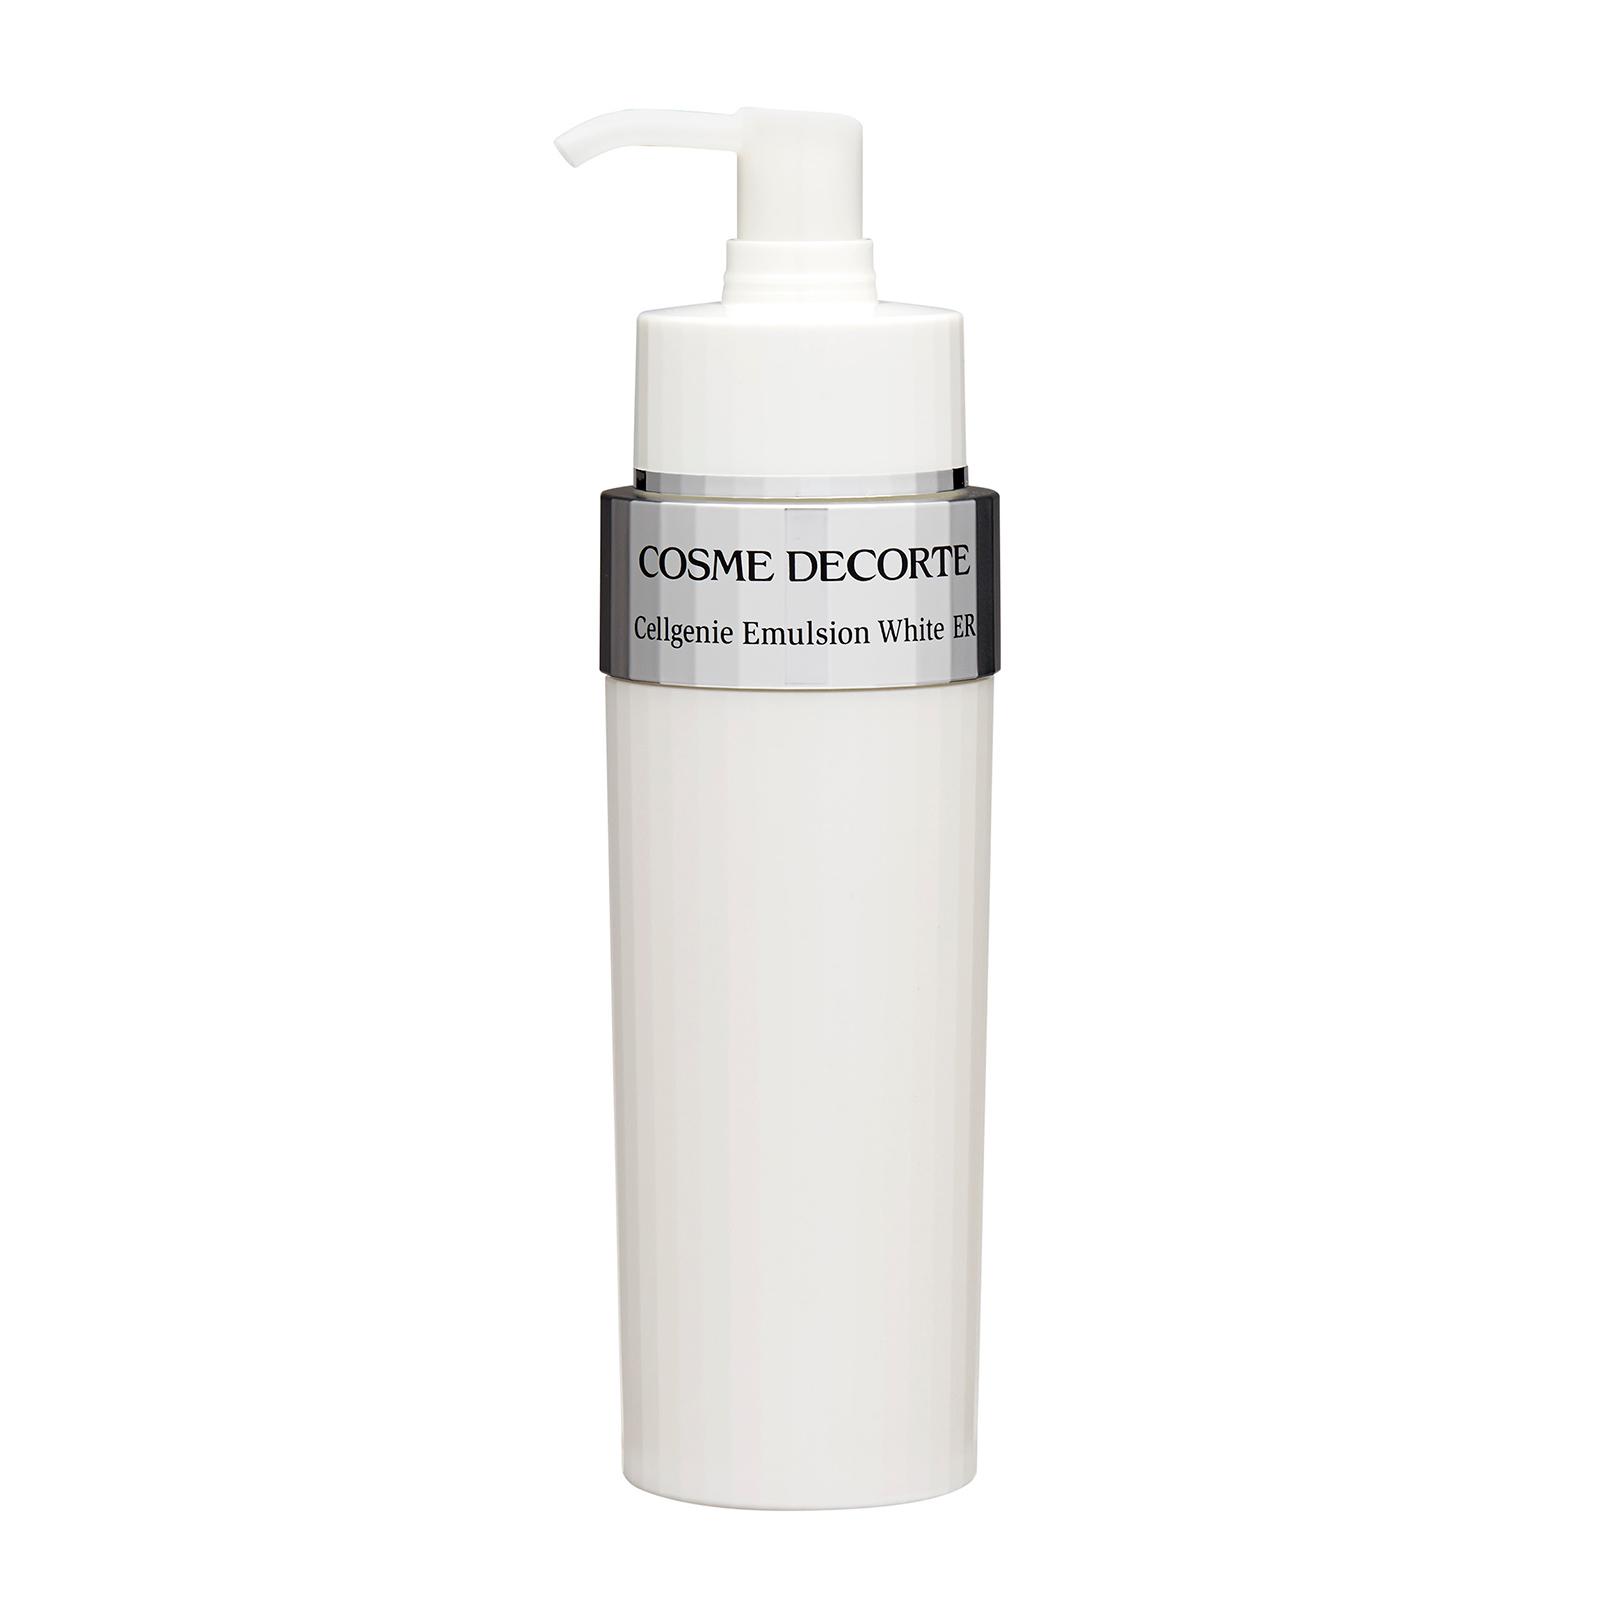 COSME DECORTE 黛珂 Cellgenie 時光活氧淨白光柔膚乳(滋潤型)6.7oz,200ml ~